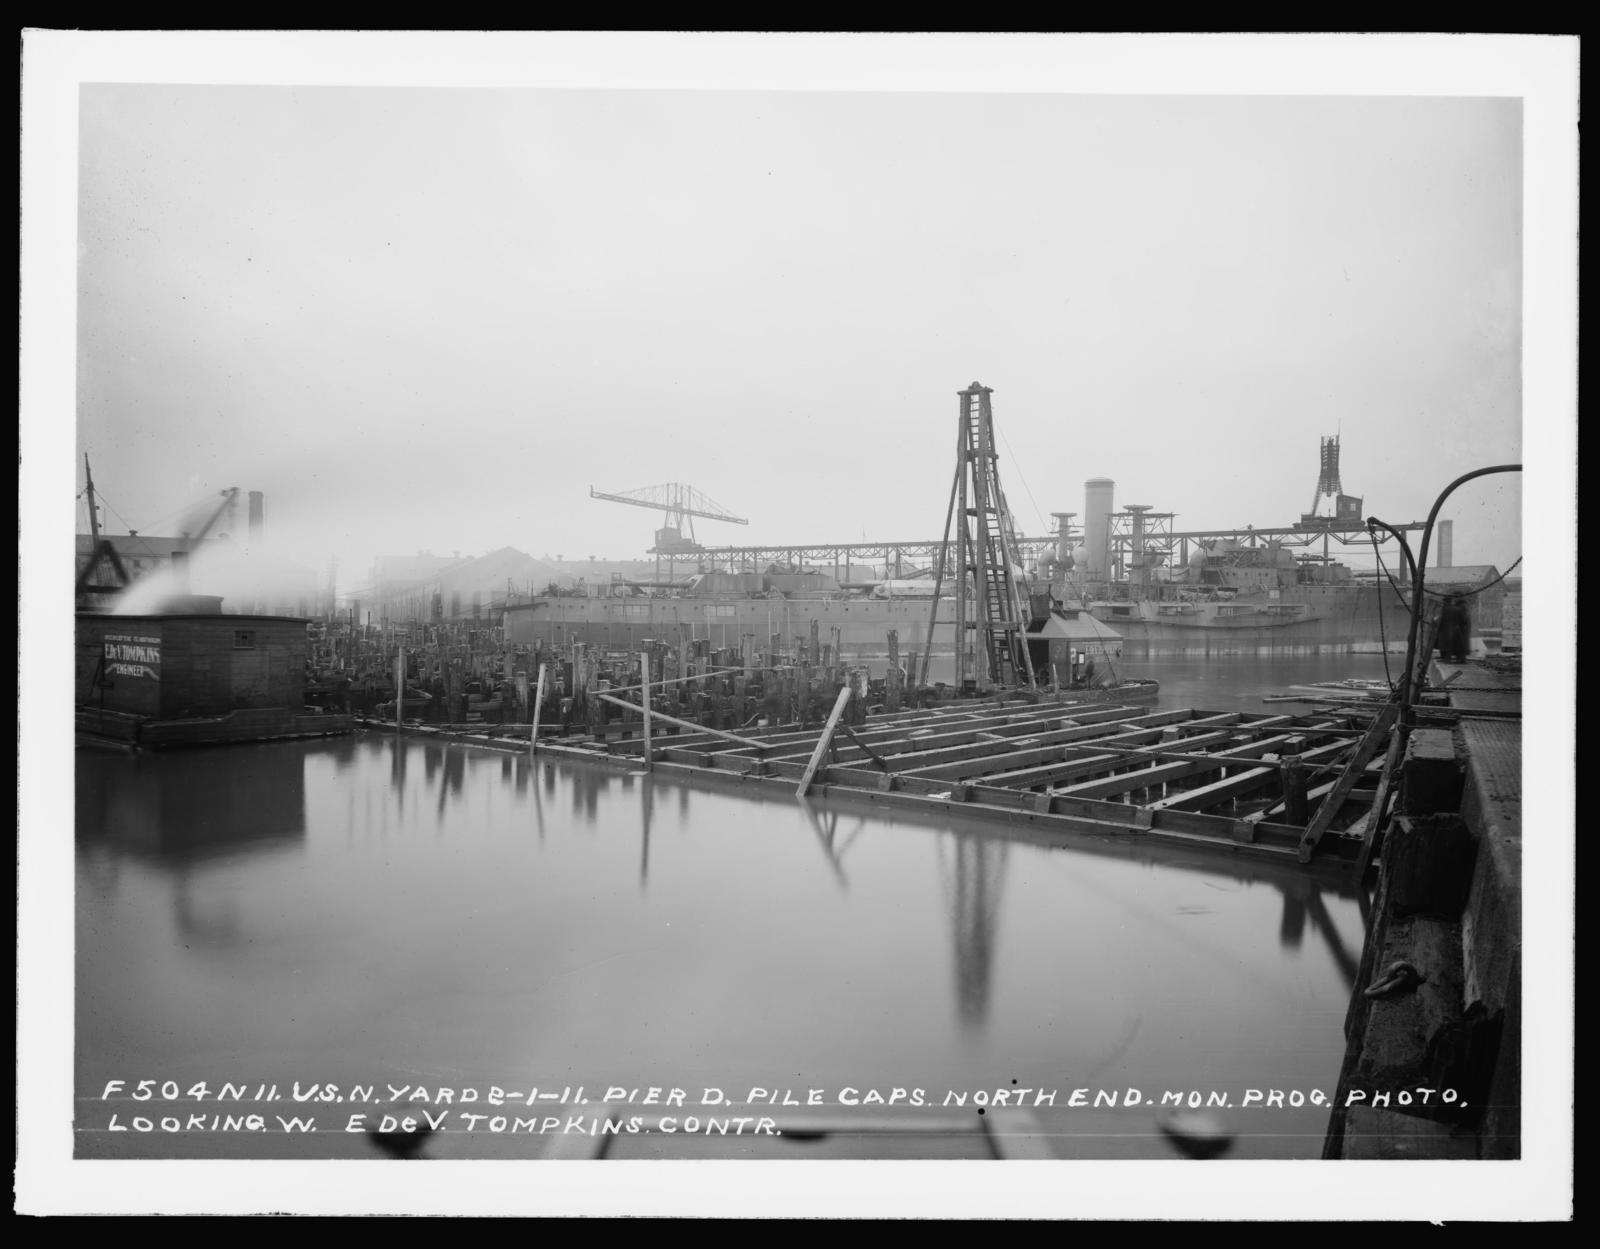 Pier D, Monthly Progress Photo, Pile Caps, North End, Looking West, E. DeV. Tompkins, Contactor